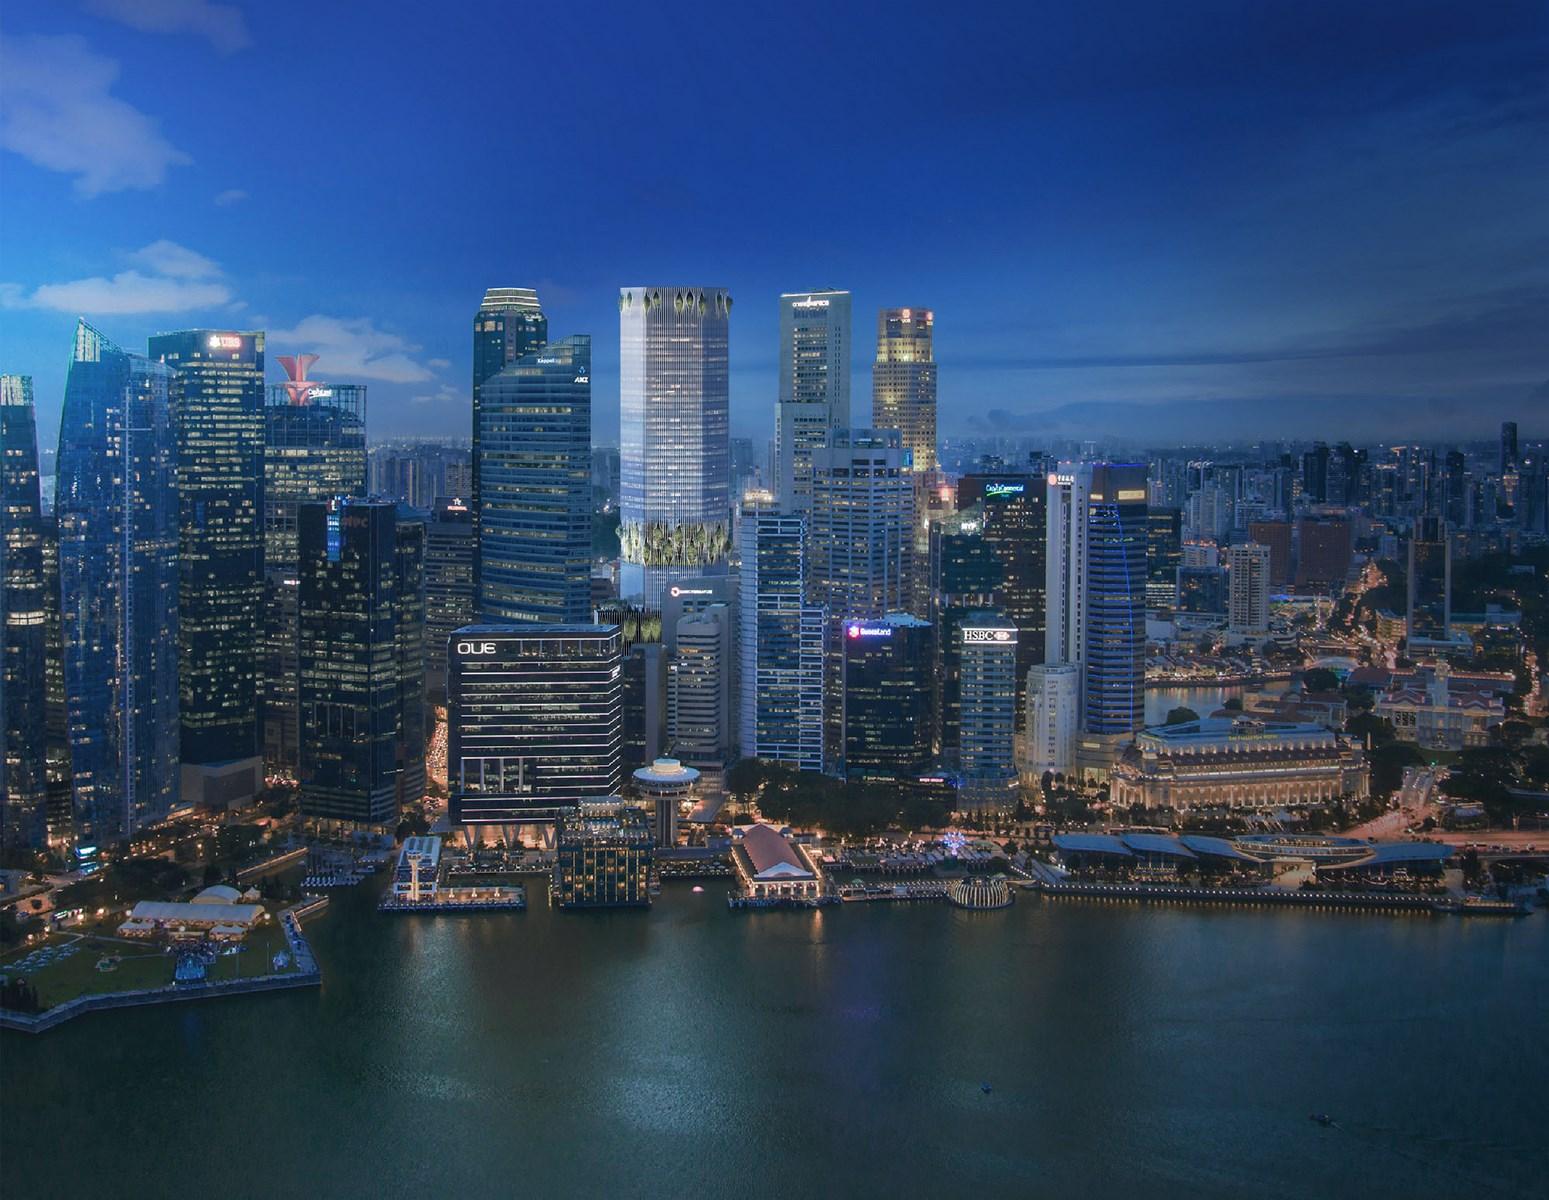 01_big_cra_singapore_night_aerial_image_by_big-bjarke_ingels_group_vmw_original (Copy)